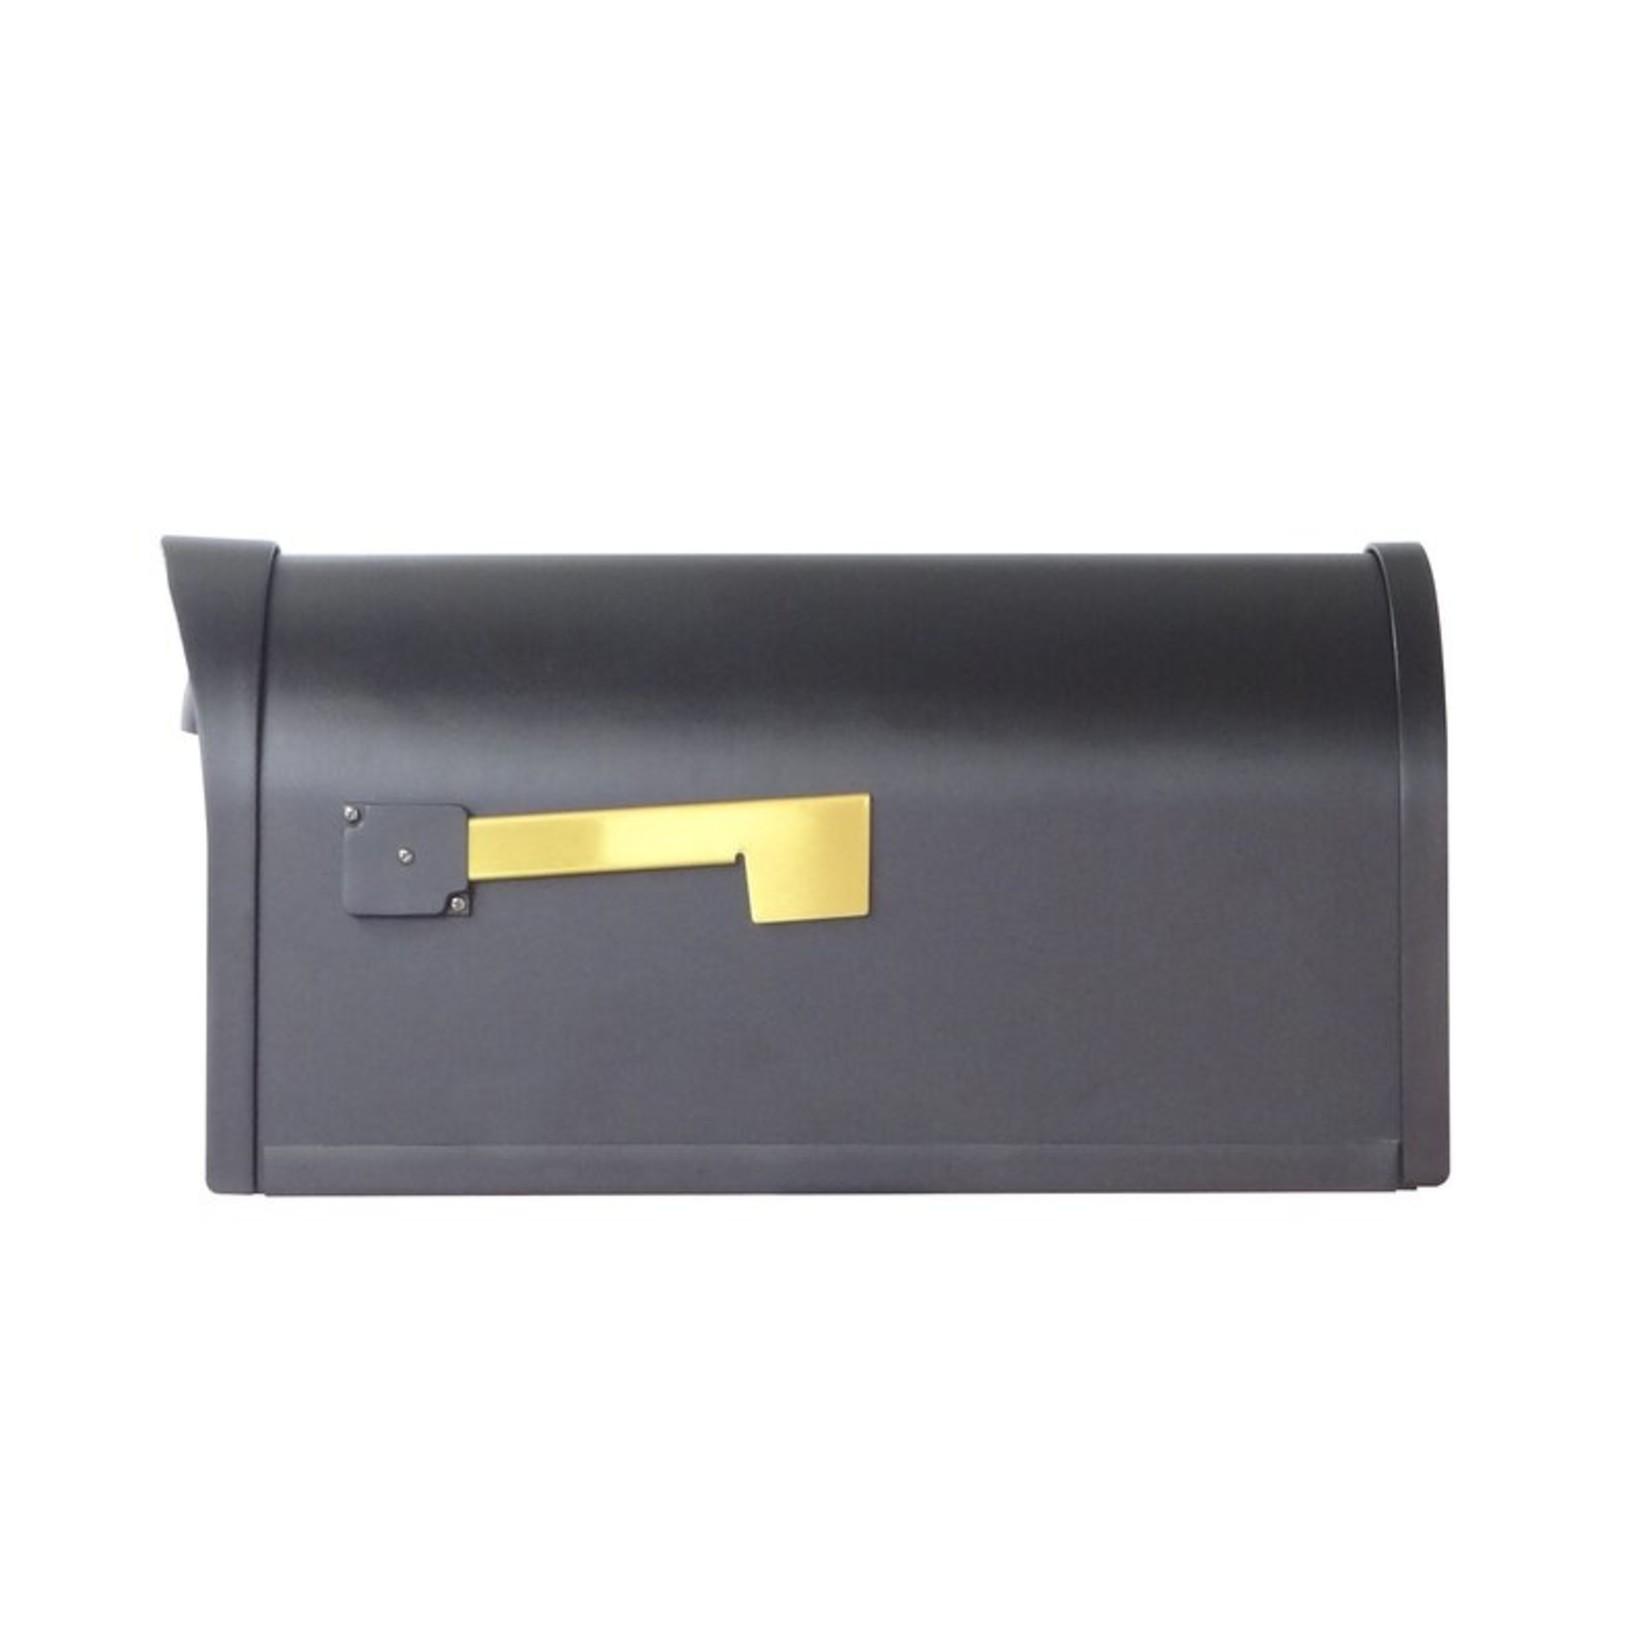 *Baldwin Post Mounted Mailbox - Black